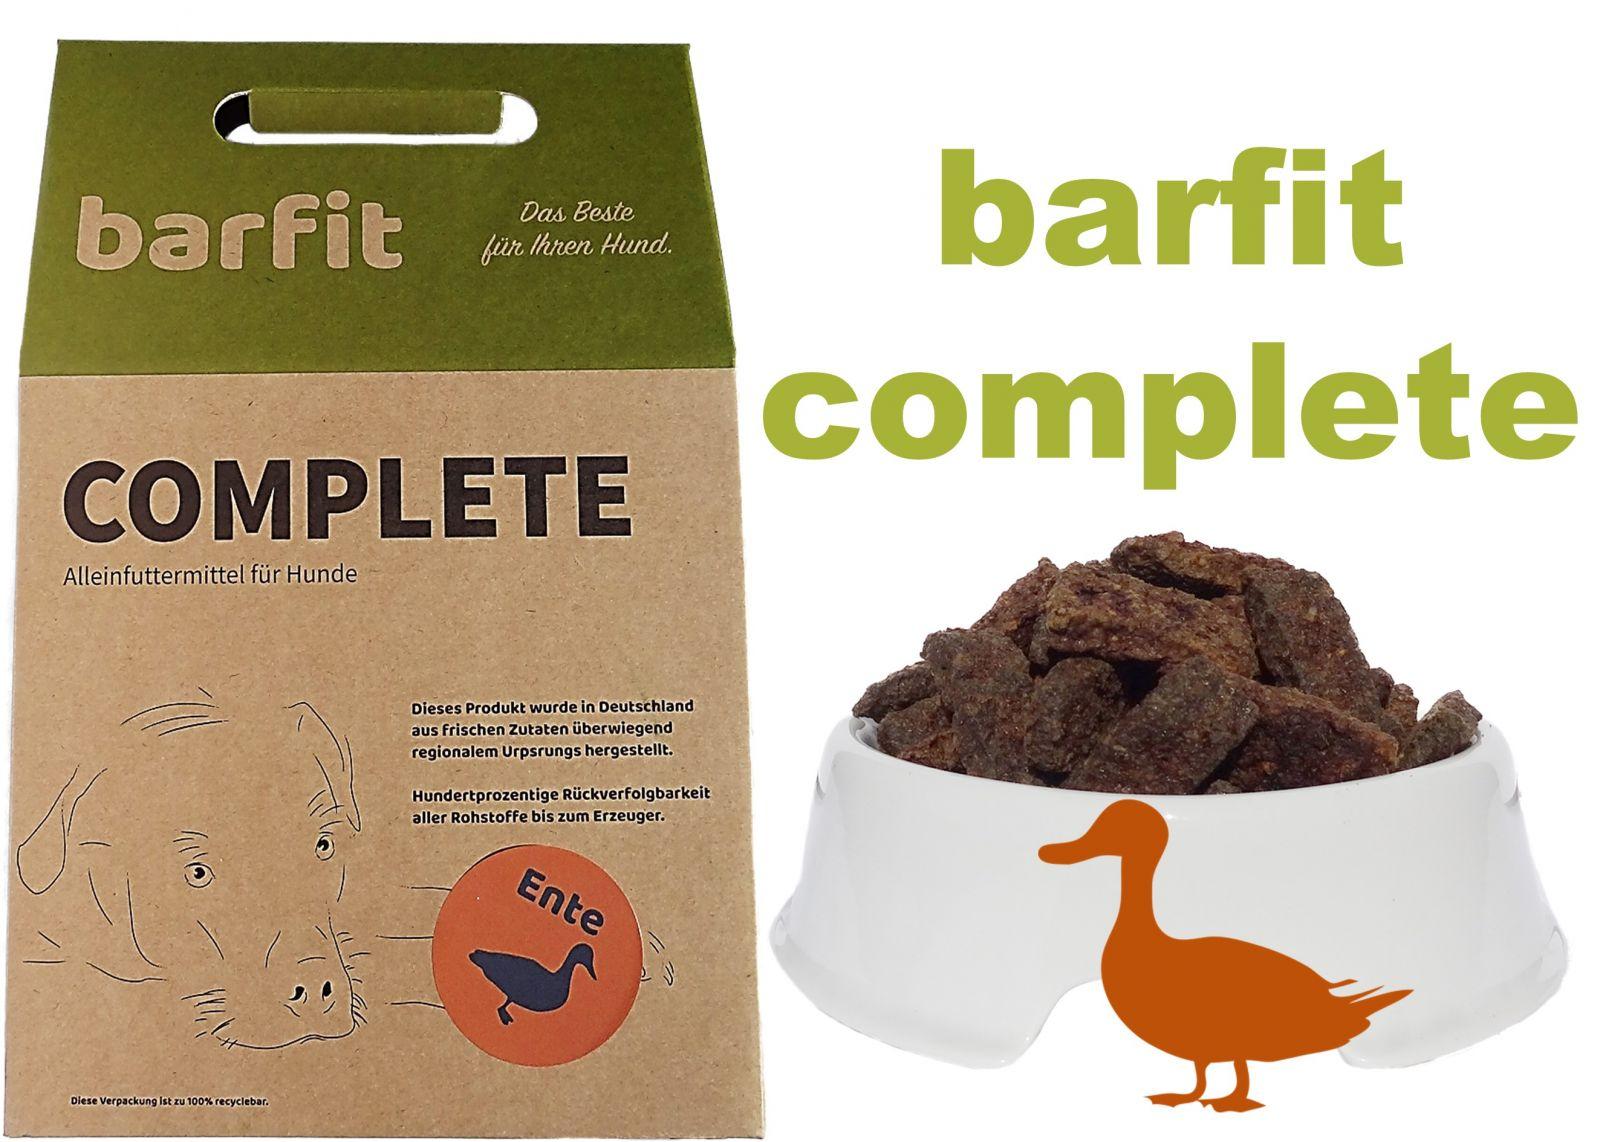 BARFIT kompletní barf směs - kachna 1000g Wallitzer